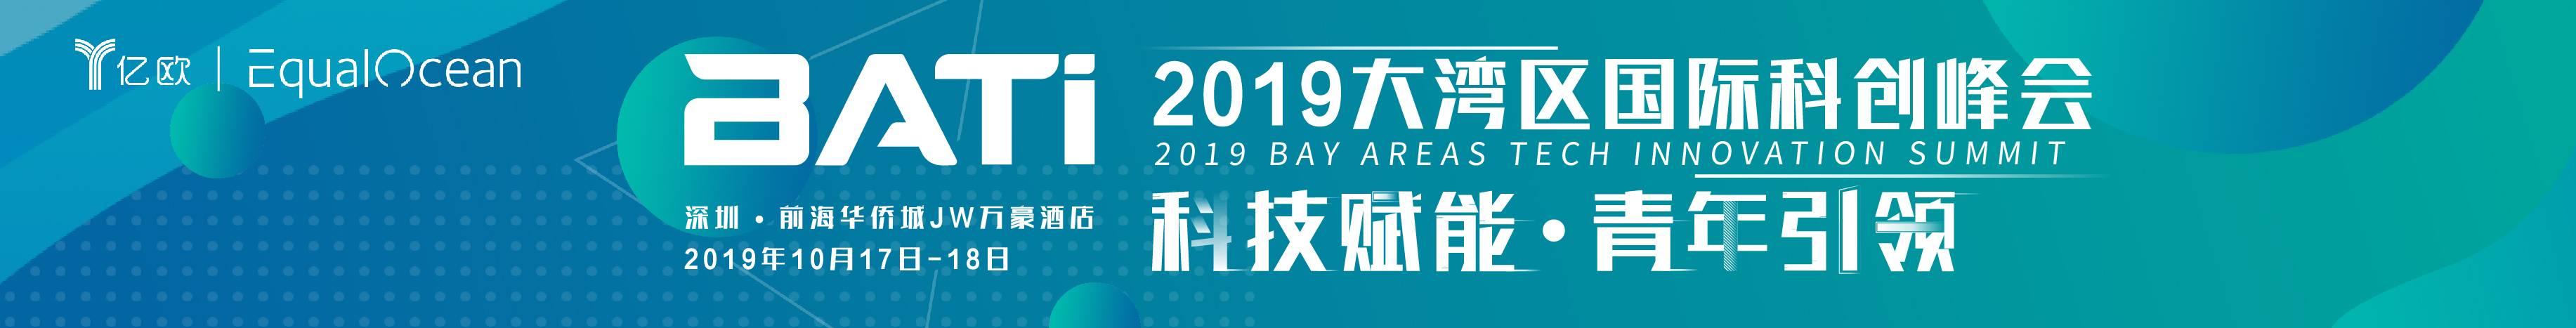 BATi 2019大湾区国际科创峰会